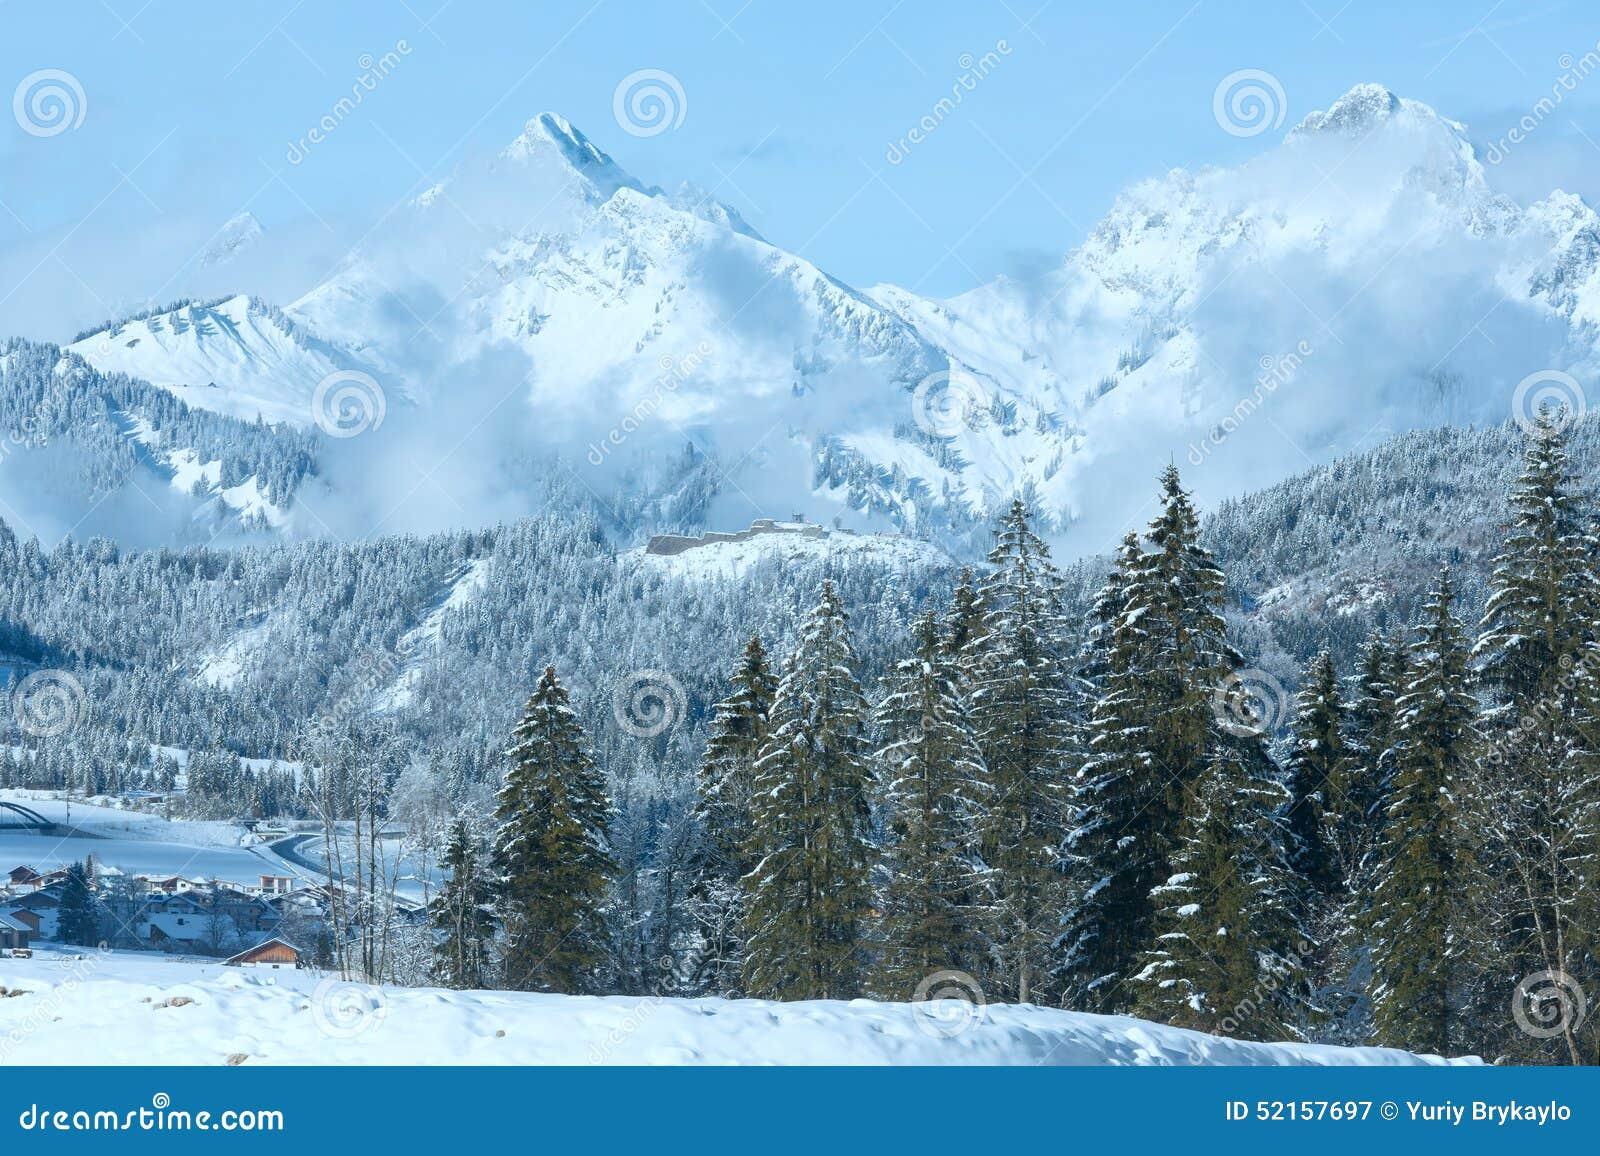 paysage de montagne d 39 hiver autriche tirol image stock image du ciel support 52157697. Black Bedroom Furniture Sets. Home Design Ideas